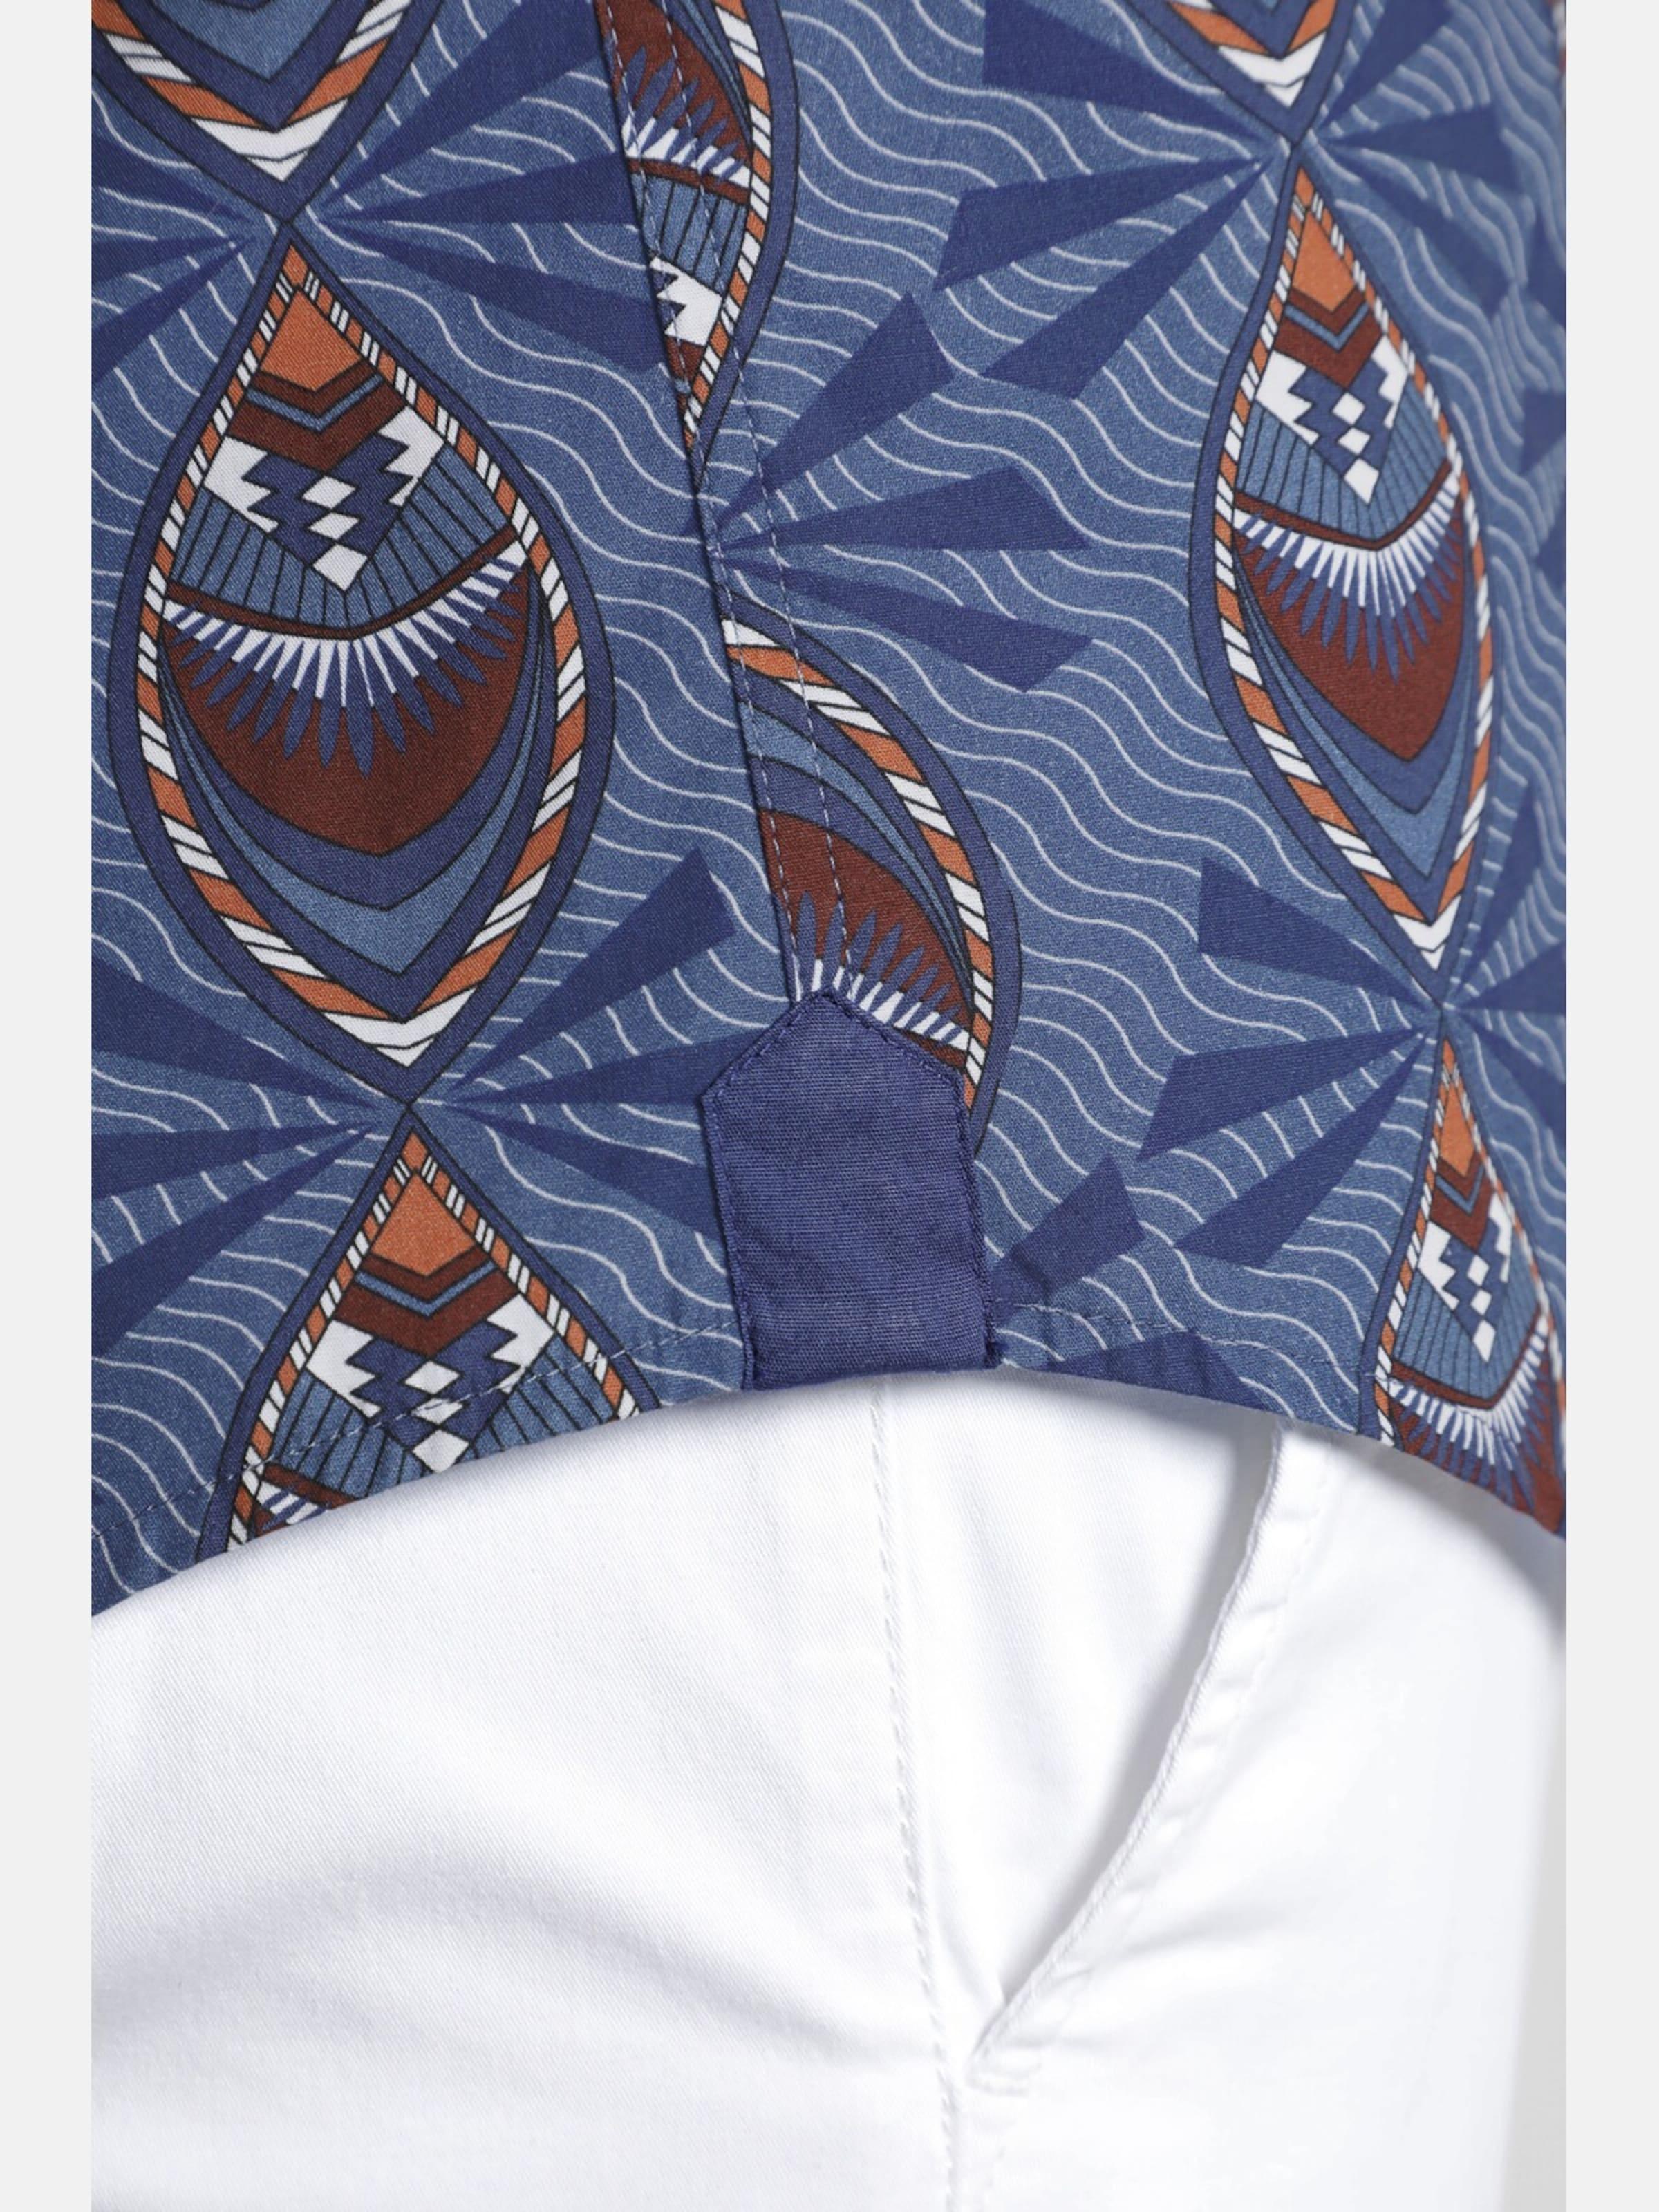 BlauBraun 'peacock' Shirtmaster Kurzarmhemd Shirtmaster In TKlF1Jc